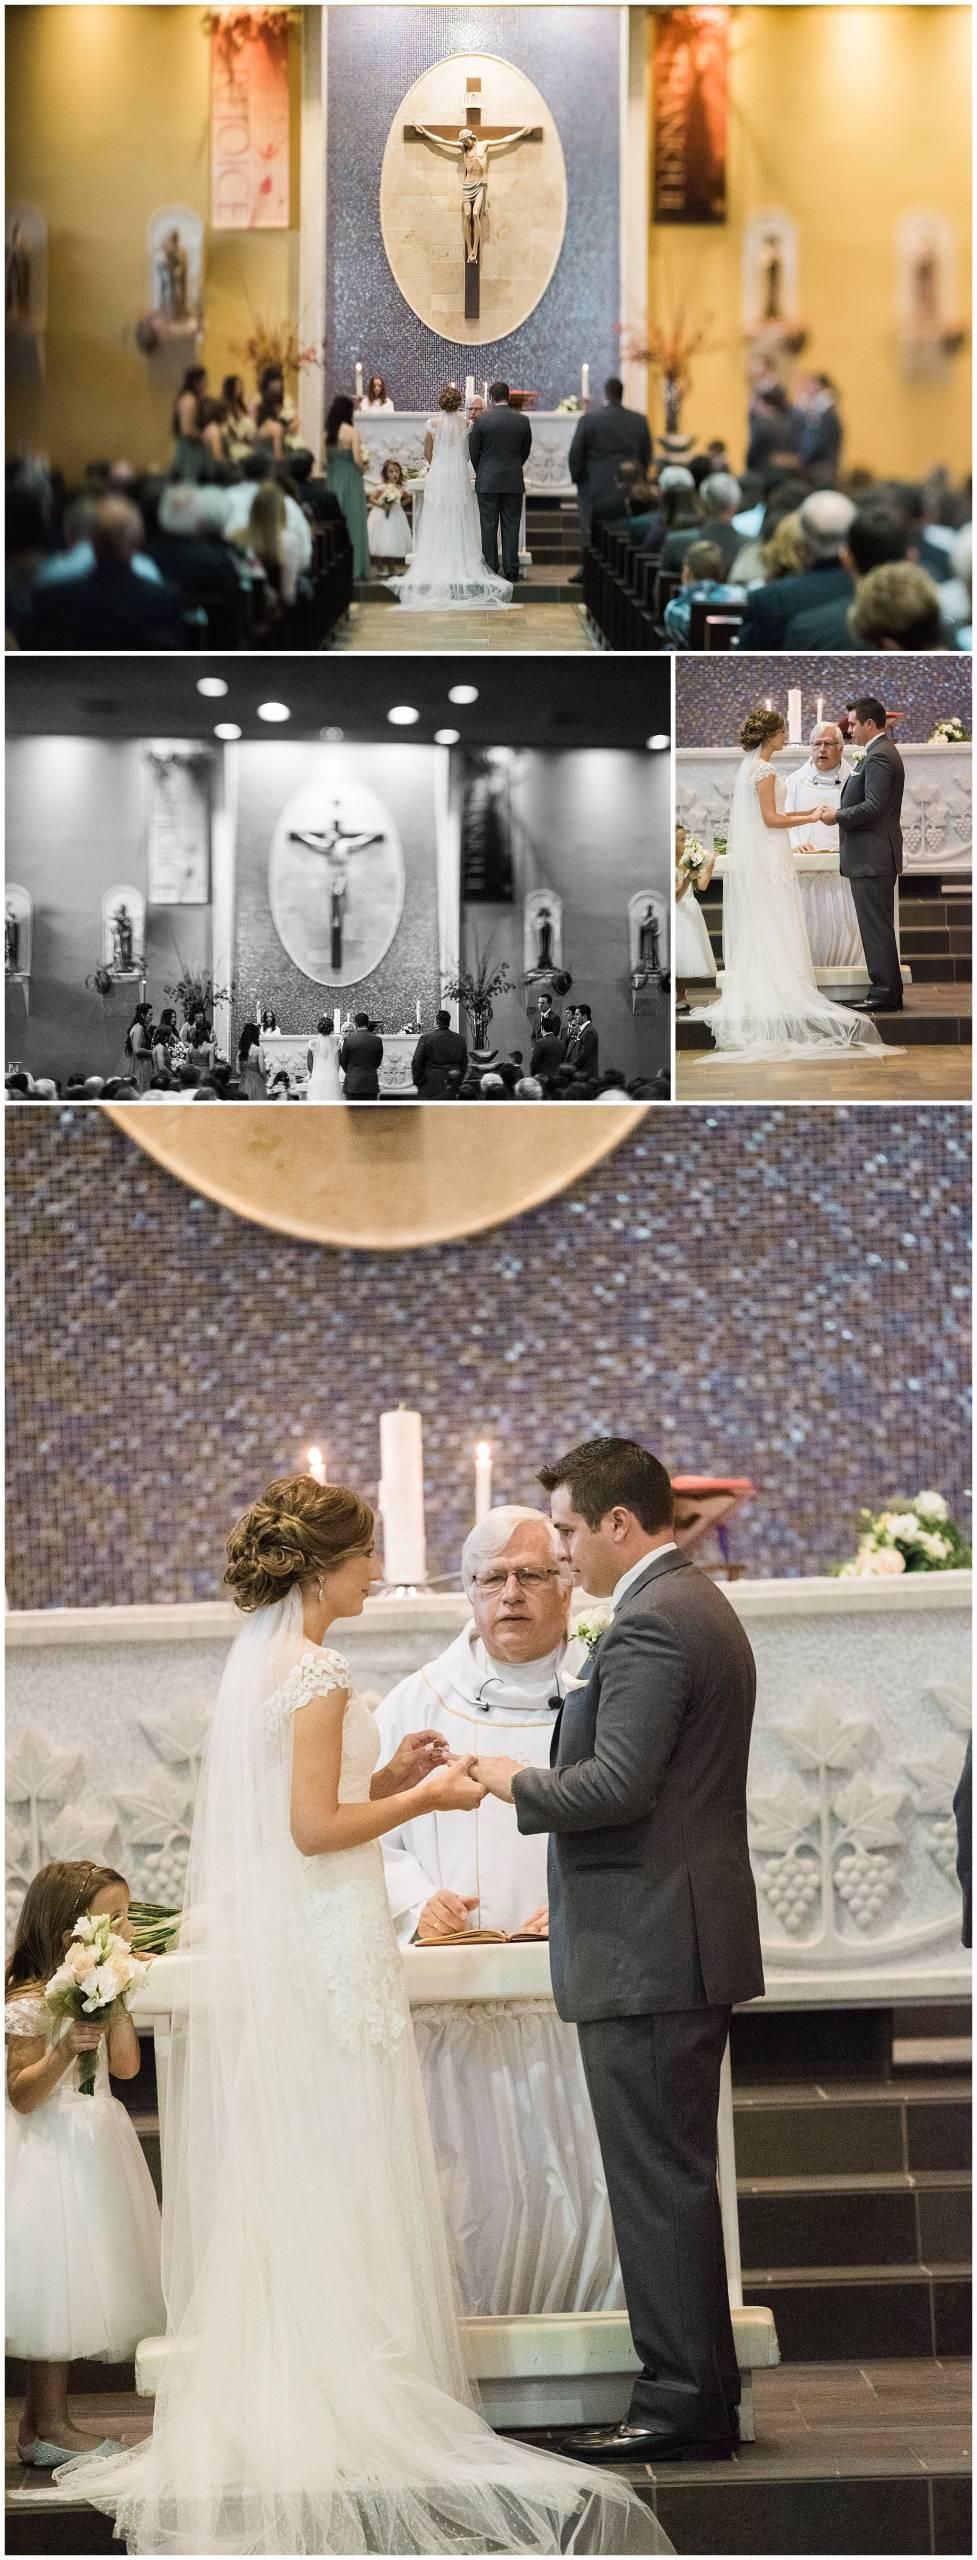 Kelcie & Devin Wedding Third Element Photography & Cinema Koetsier Ranch Visalia Tulare Fresno Hybrid Film Wedding Photographer_0017